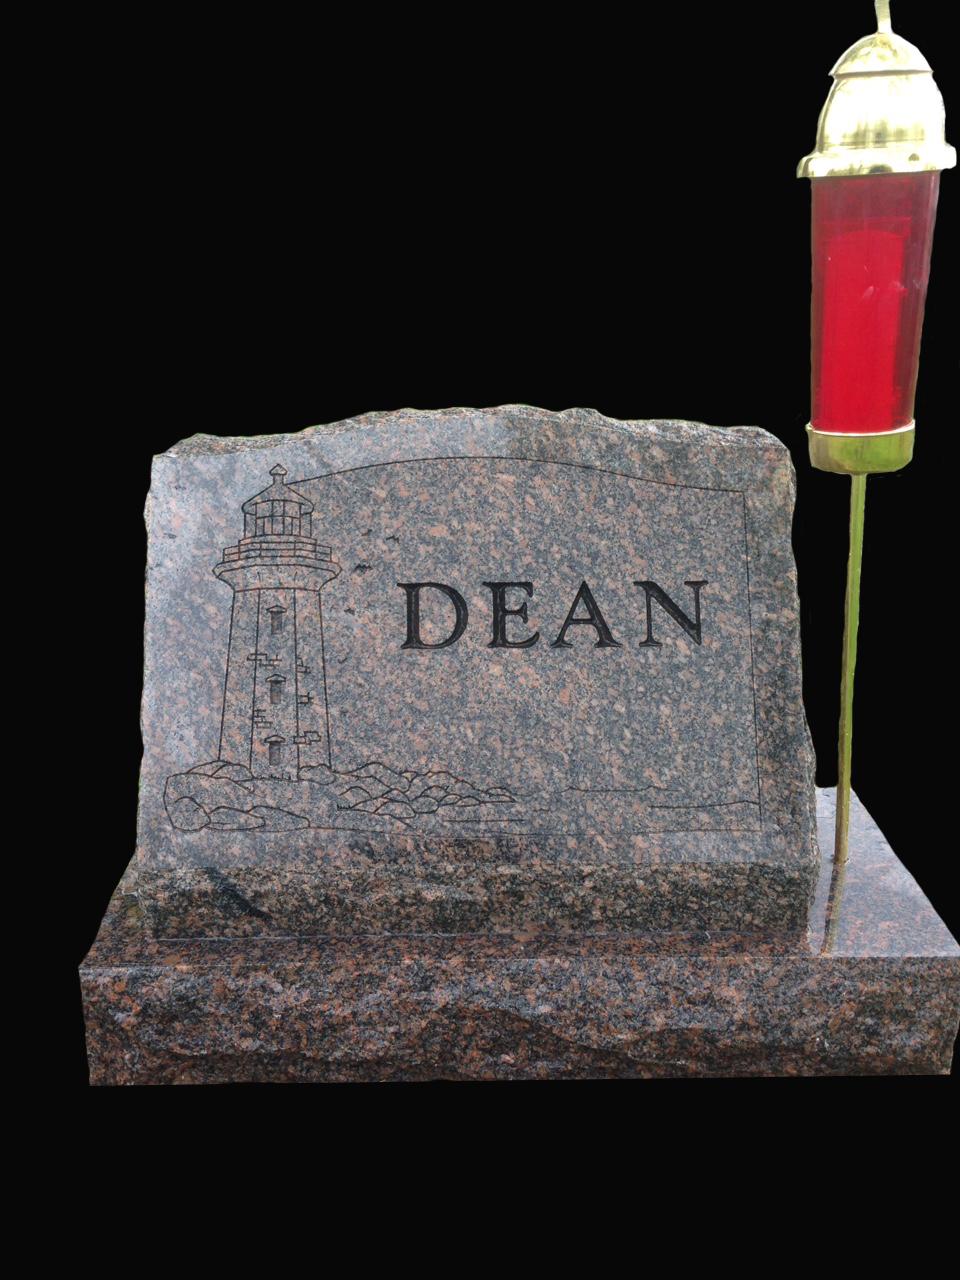 Dakota Mahogany Slant (Polished border with lighthouse carving and candle holder)  Stone is shown wet from setting